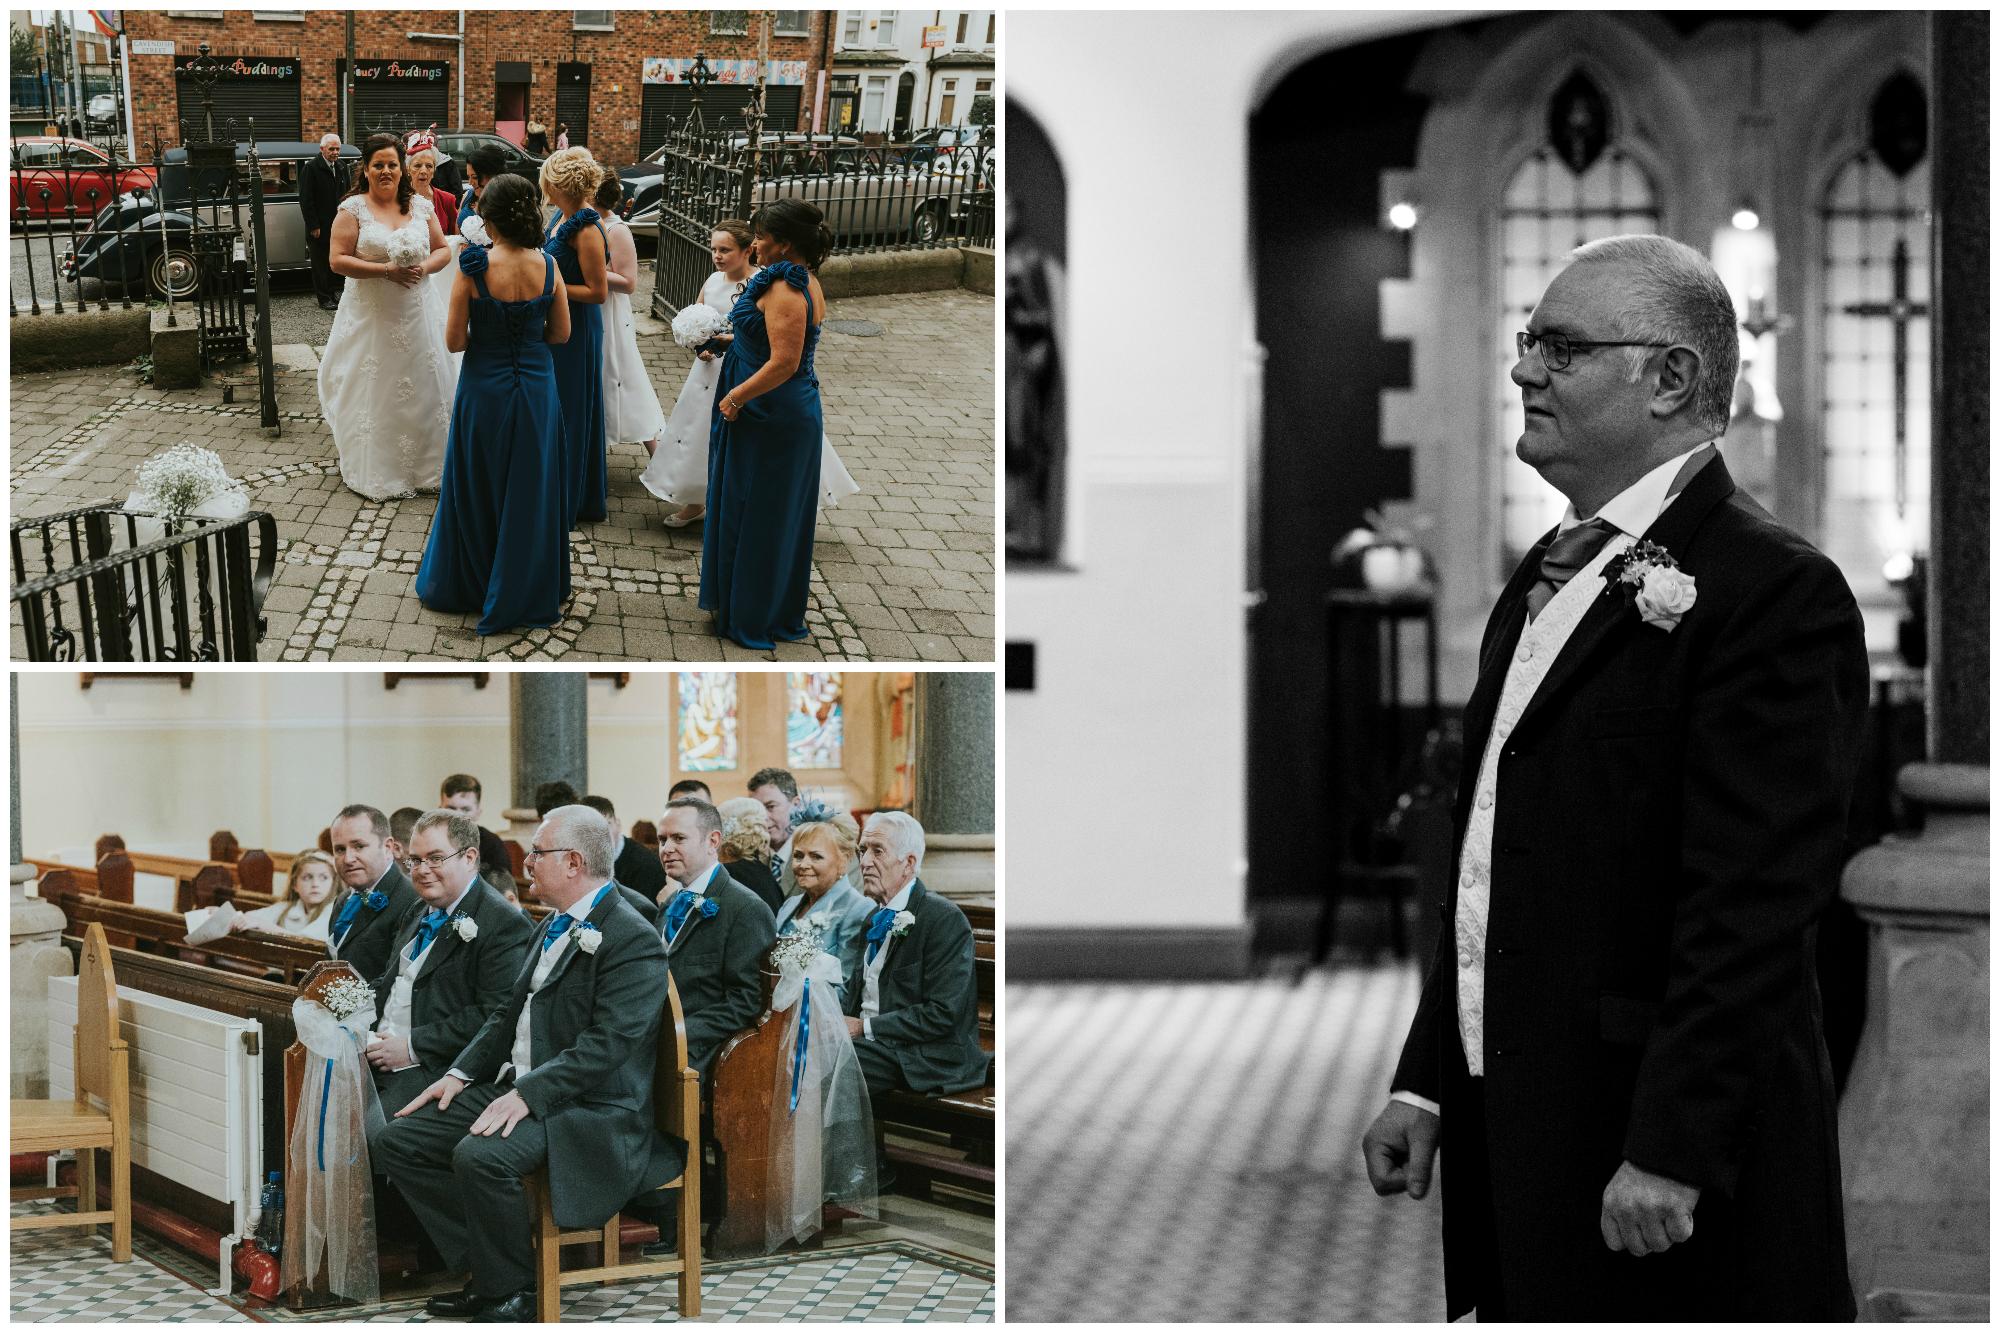 St. Pauls belfast wedding photographer pure photo n.i waiting groom